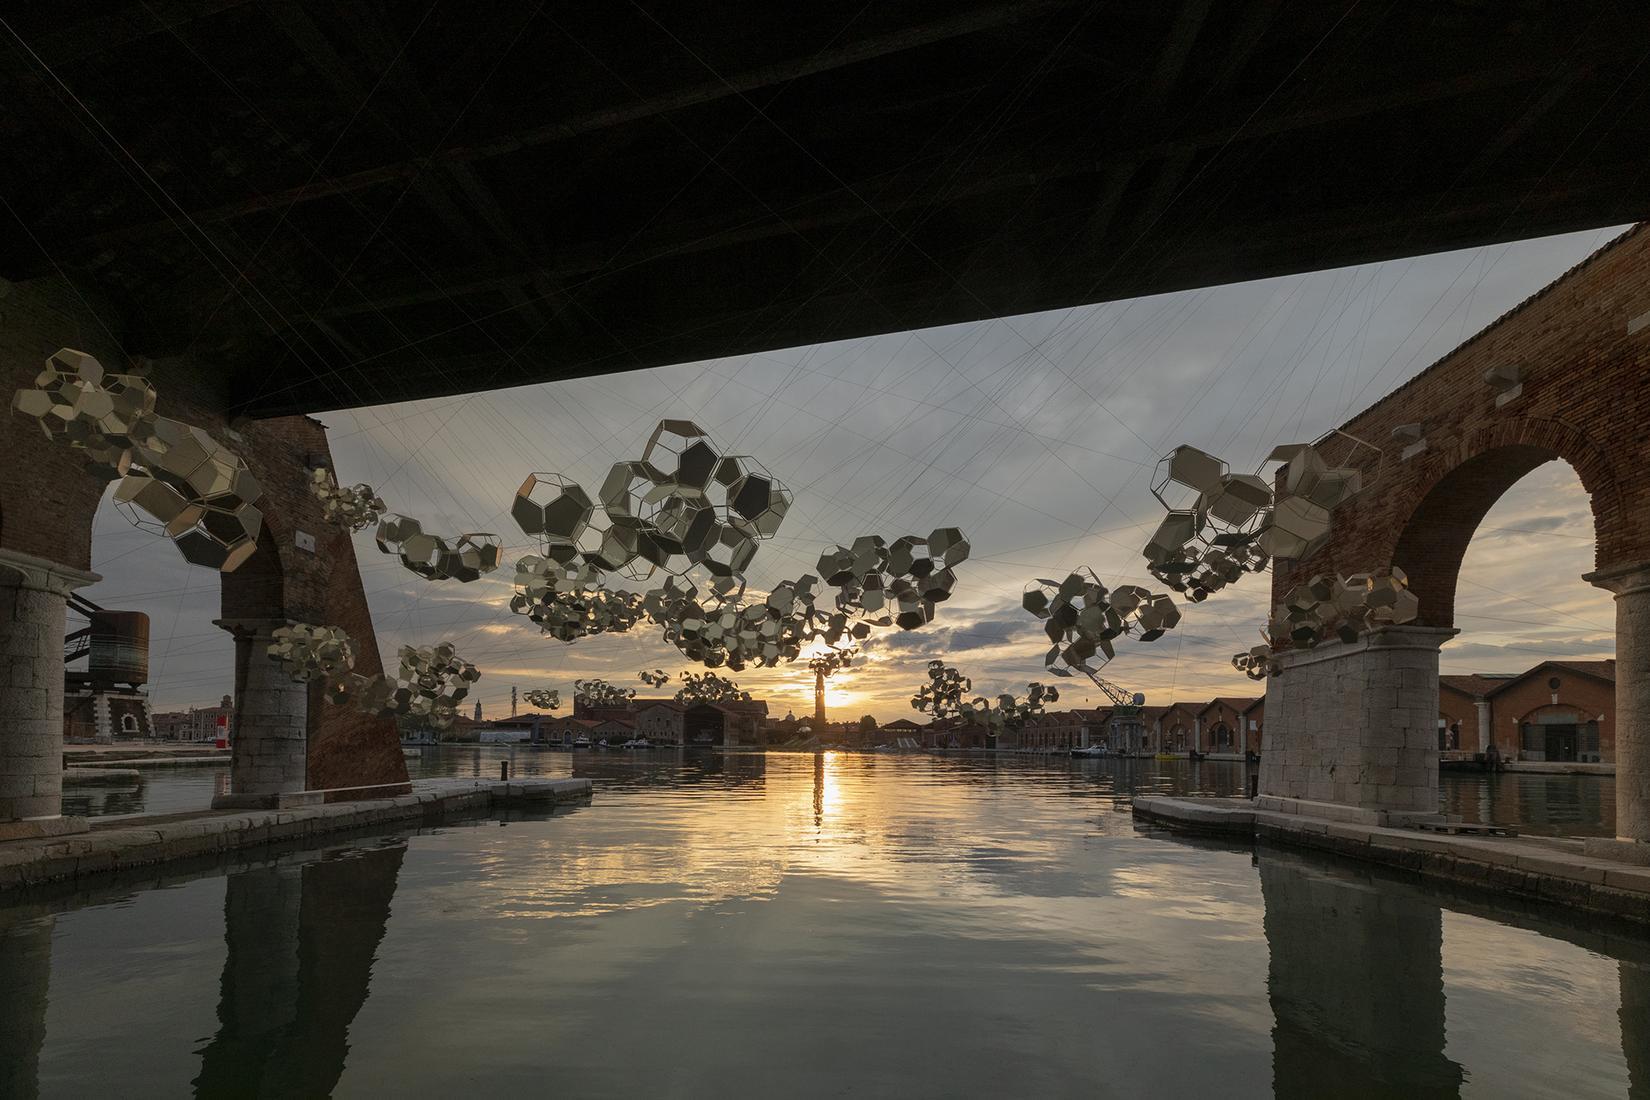 May 11 — November 24, 2019 - LA BIENNALE DI VENEZIA - Tomás Saraceno: May You Live In Interesting Times -  - Exhibitions